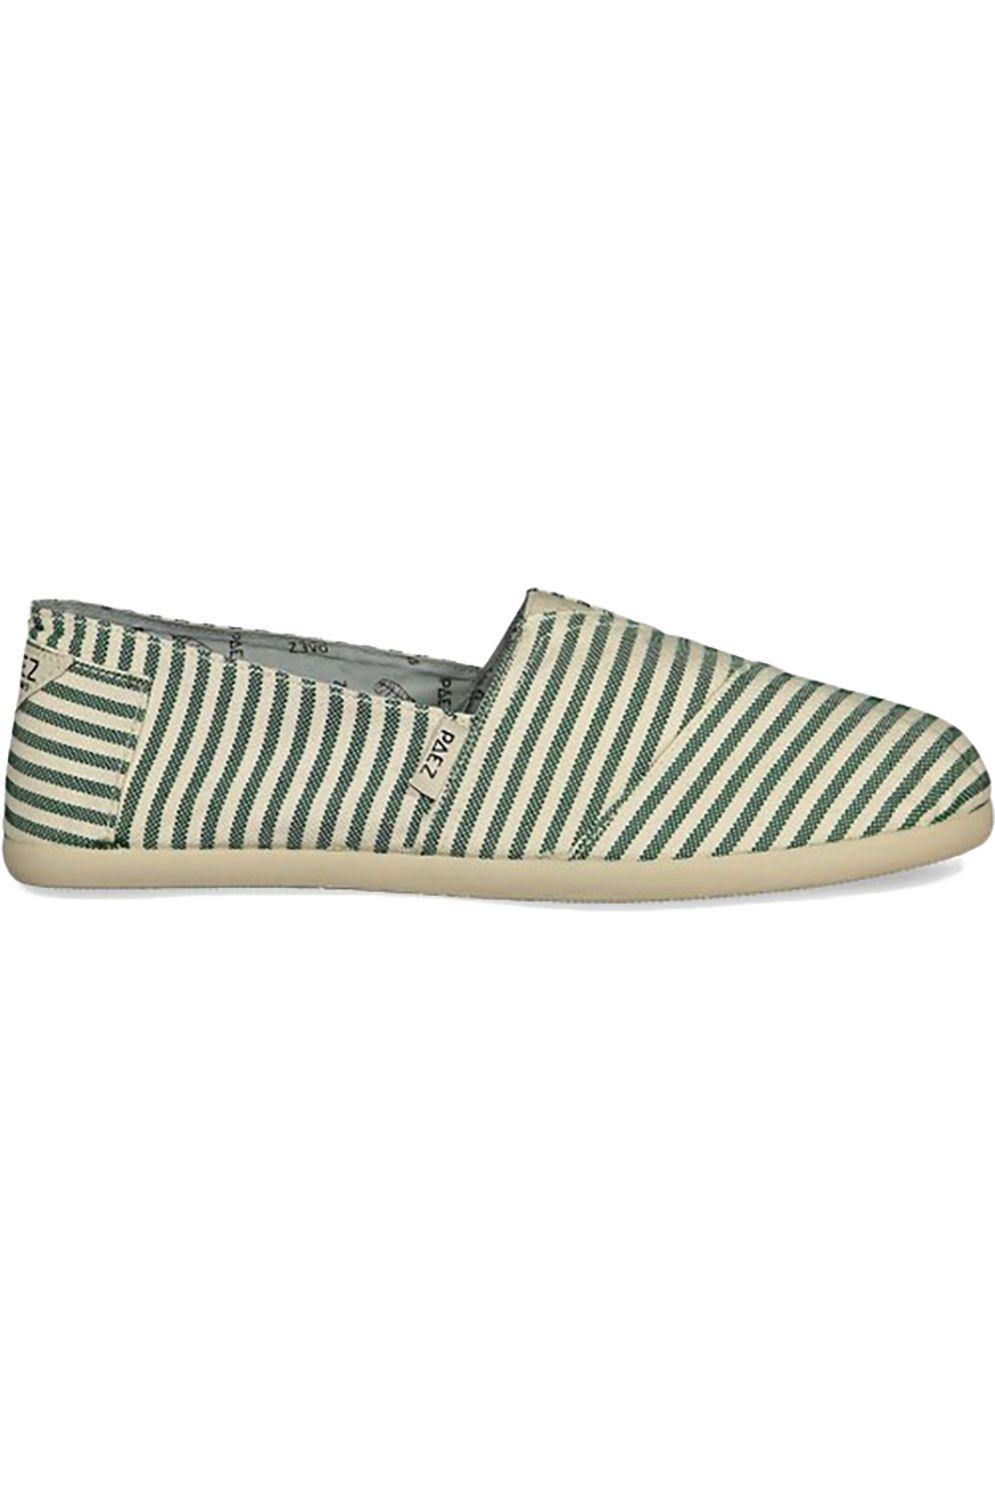 Paez Sandals SURFY Green/Beige